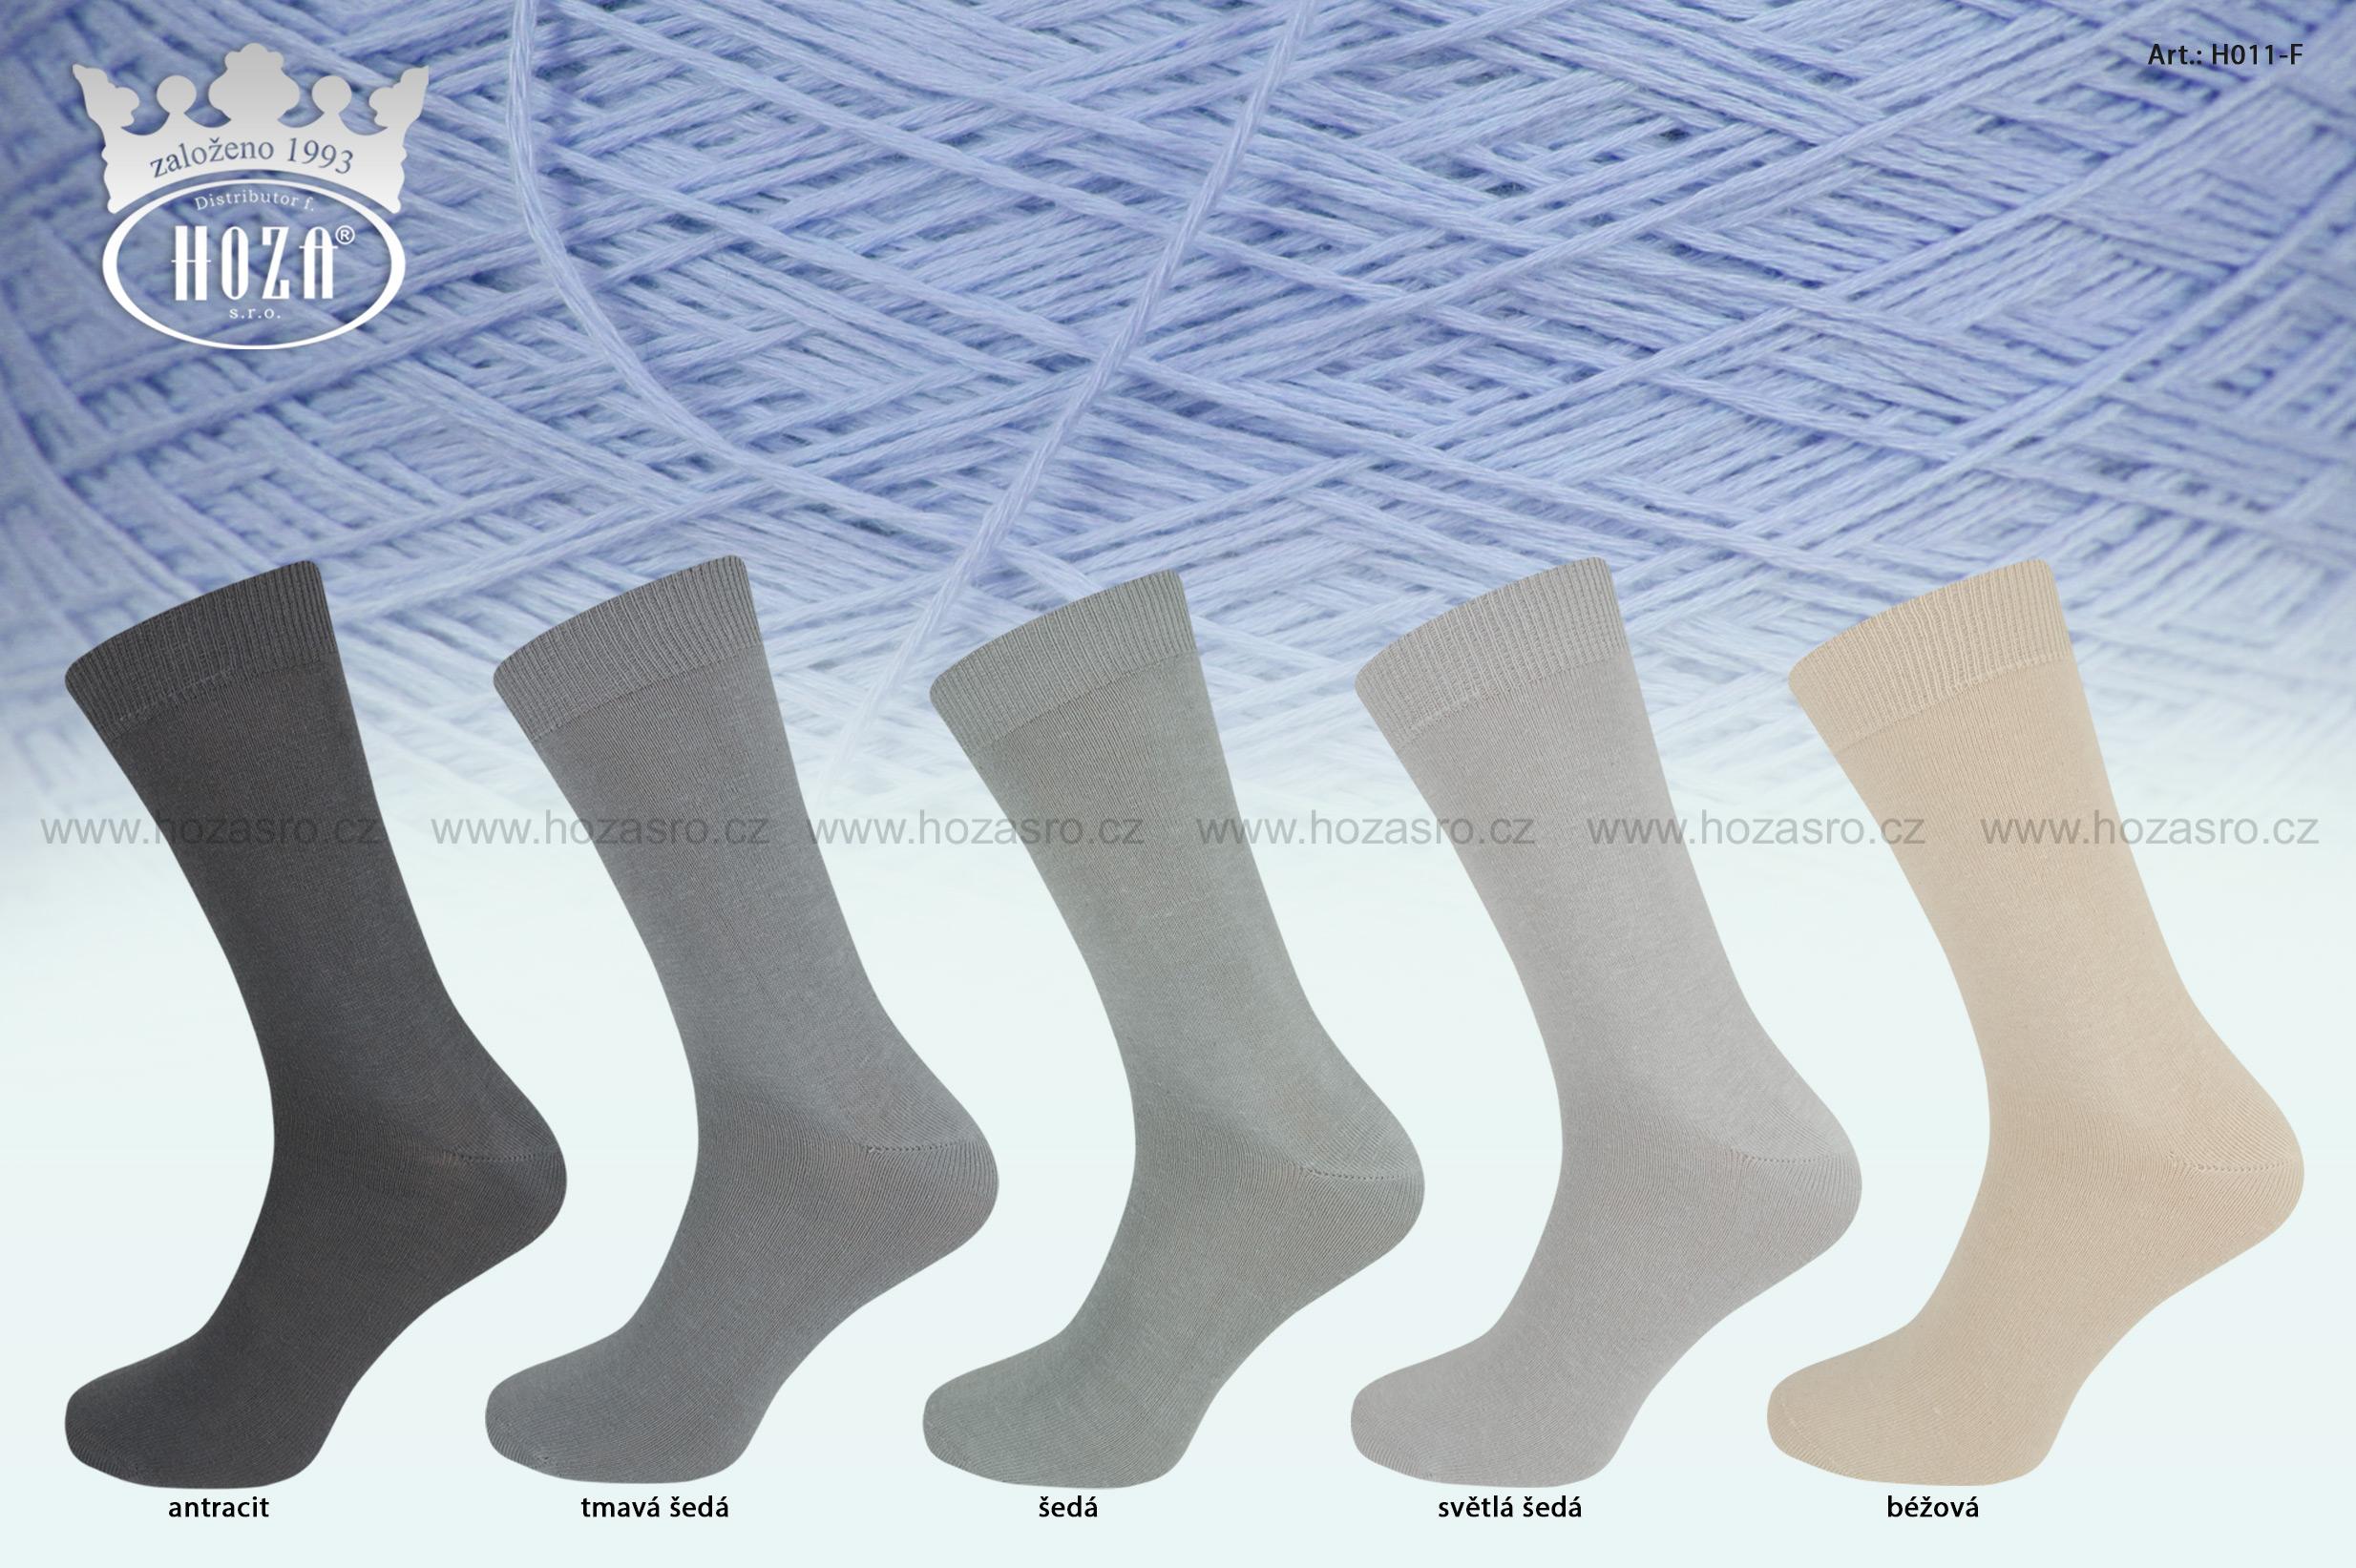 Pánské ponožky hladké, 100% bavlna - šedý mix - H011-F